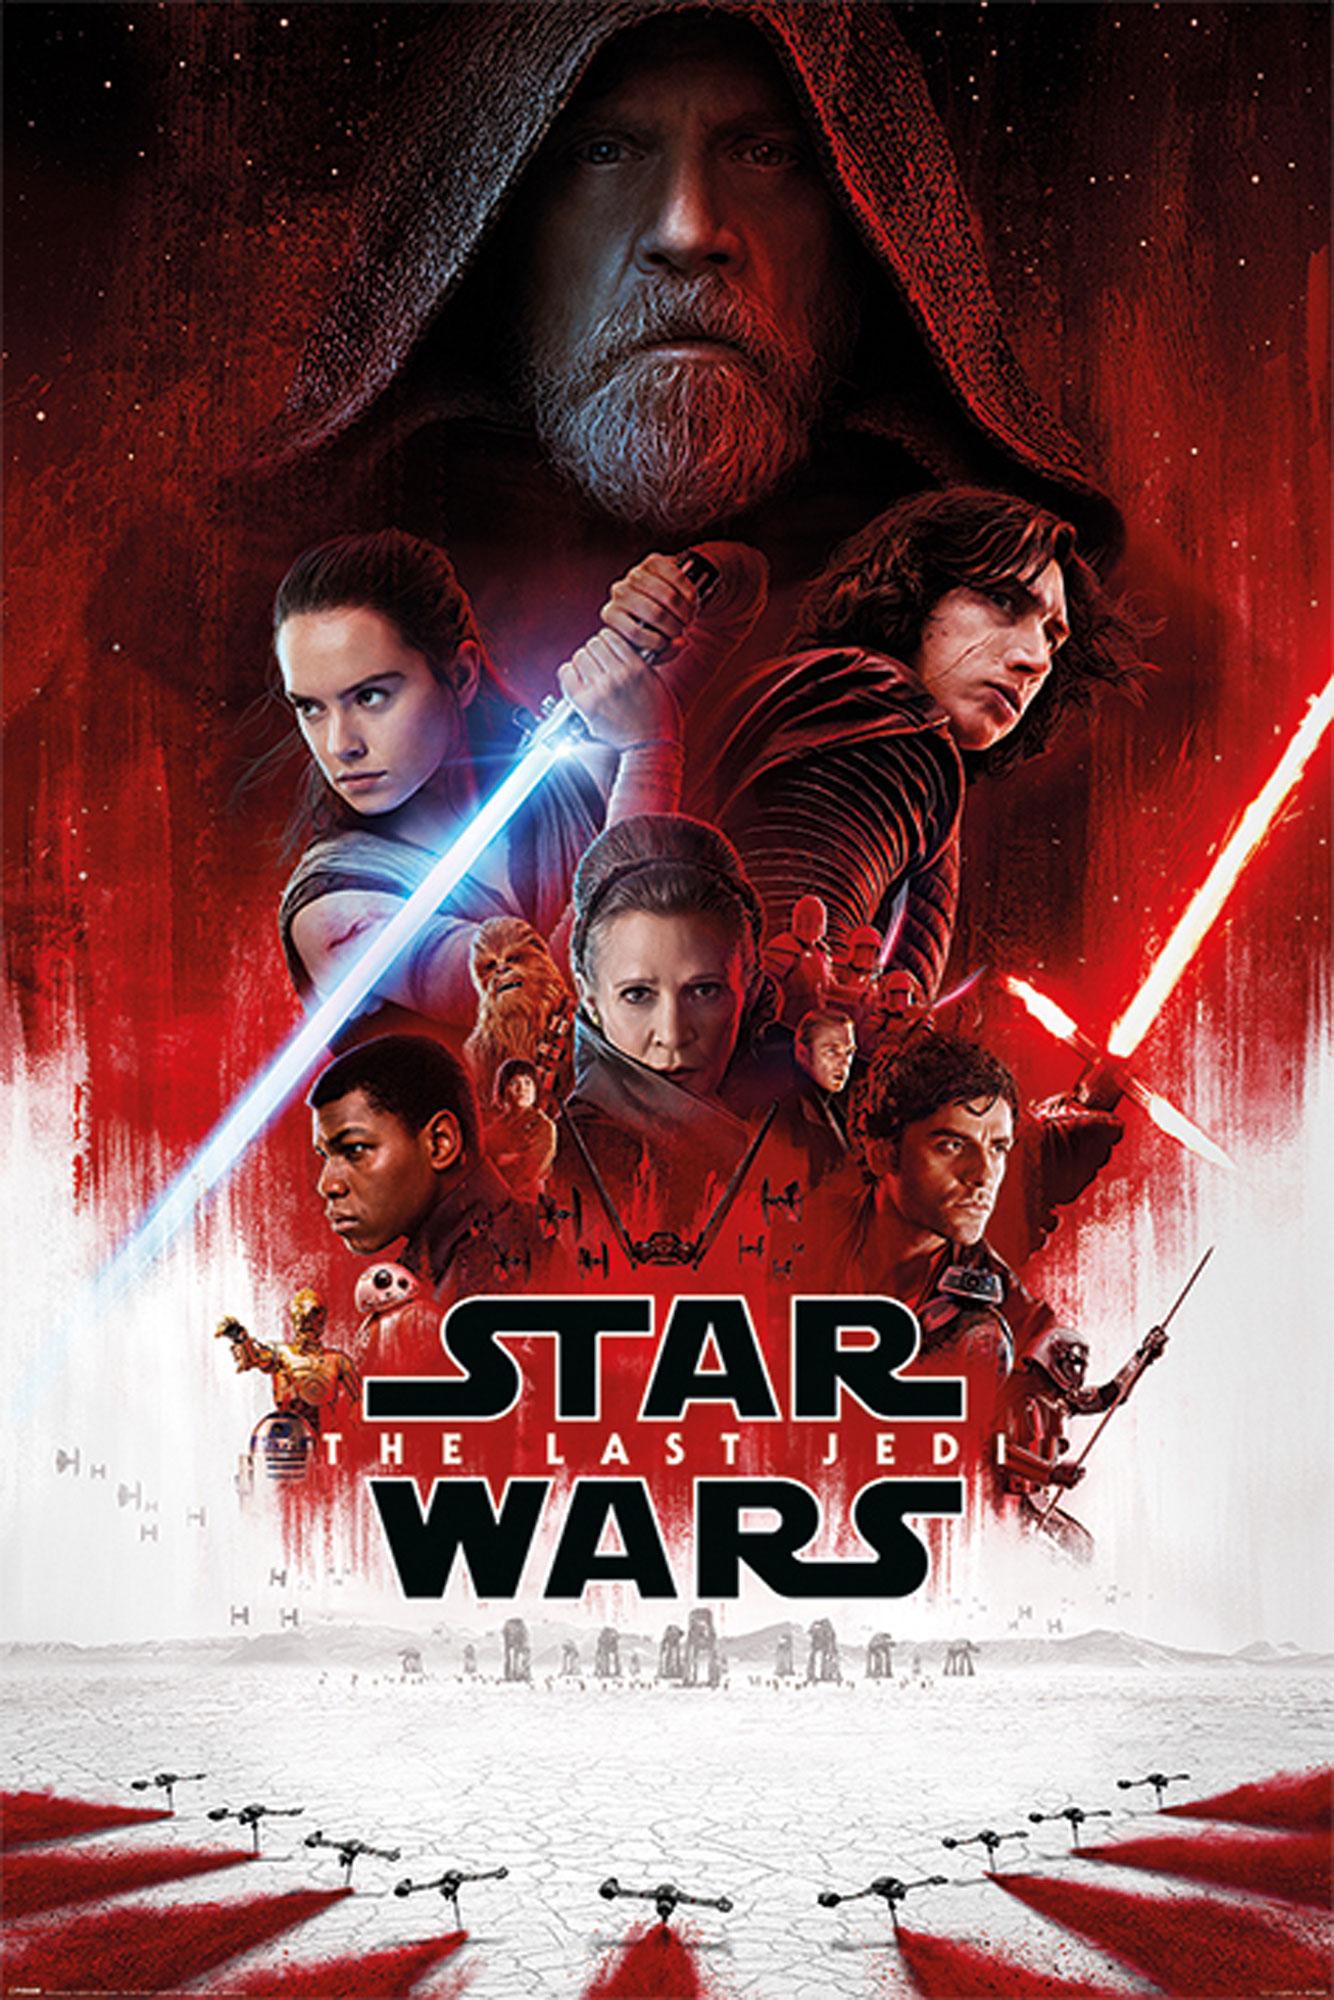 Star Wars - The Last Jedi - EP8 - One Sheet - Poster Plakat - Größe ...